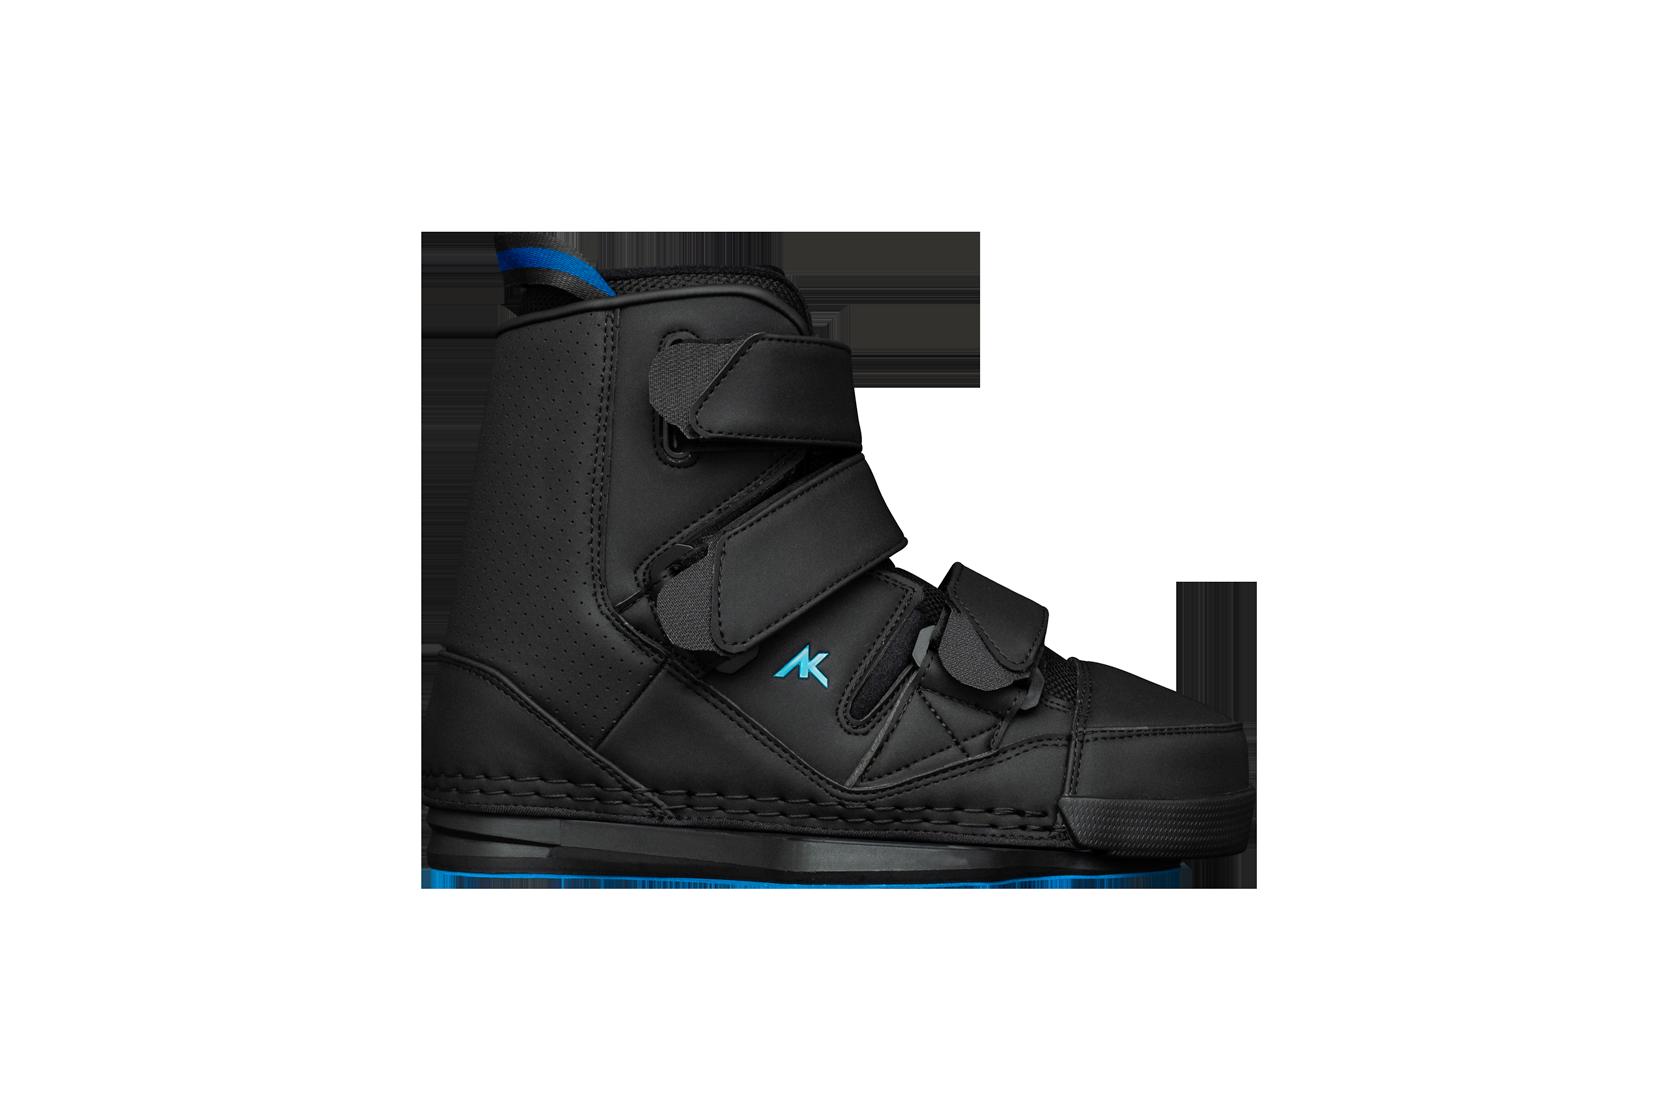 21_AK_Static Boot_img-01